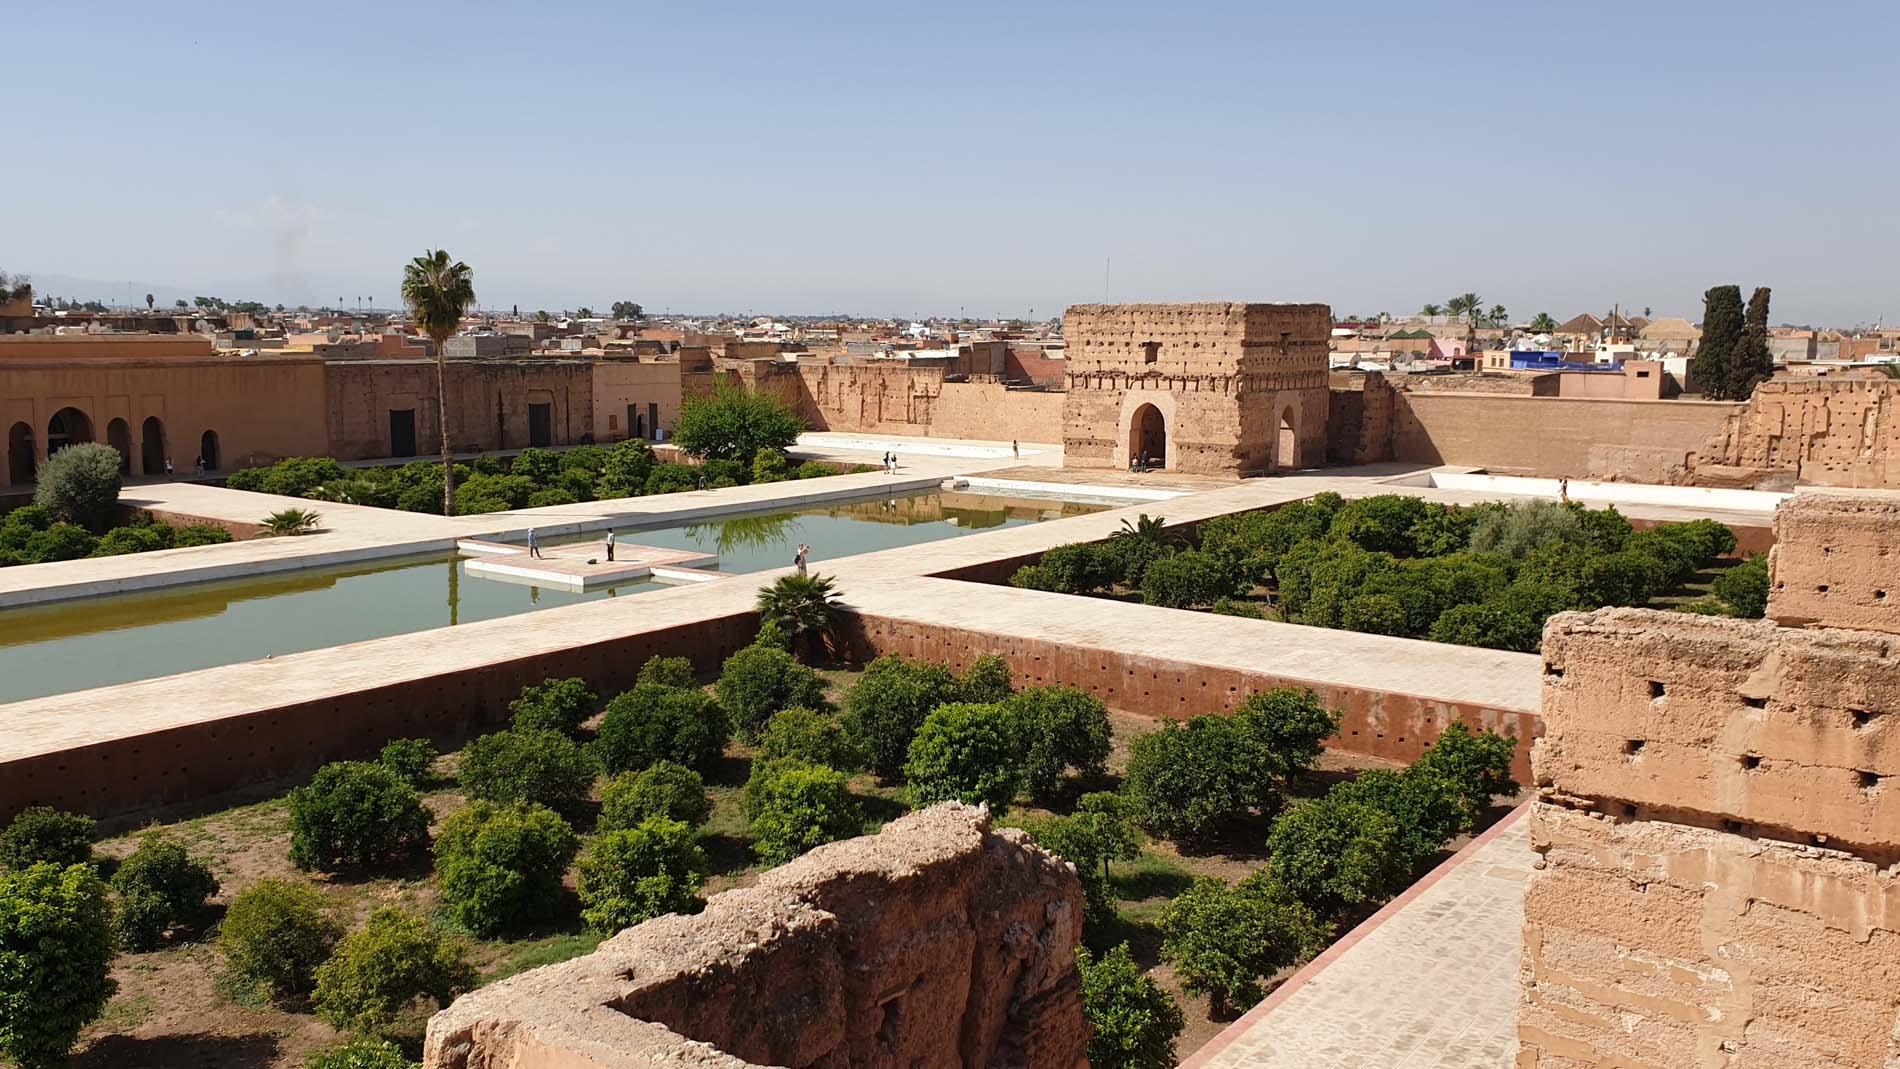 2-El-Badi-Palace-2.jpg